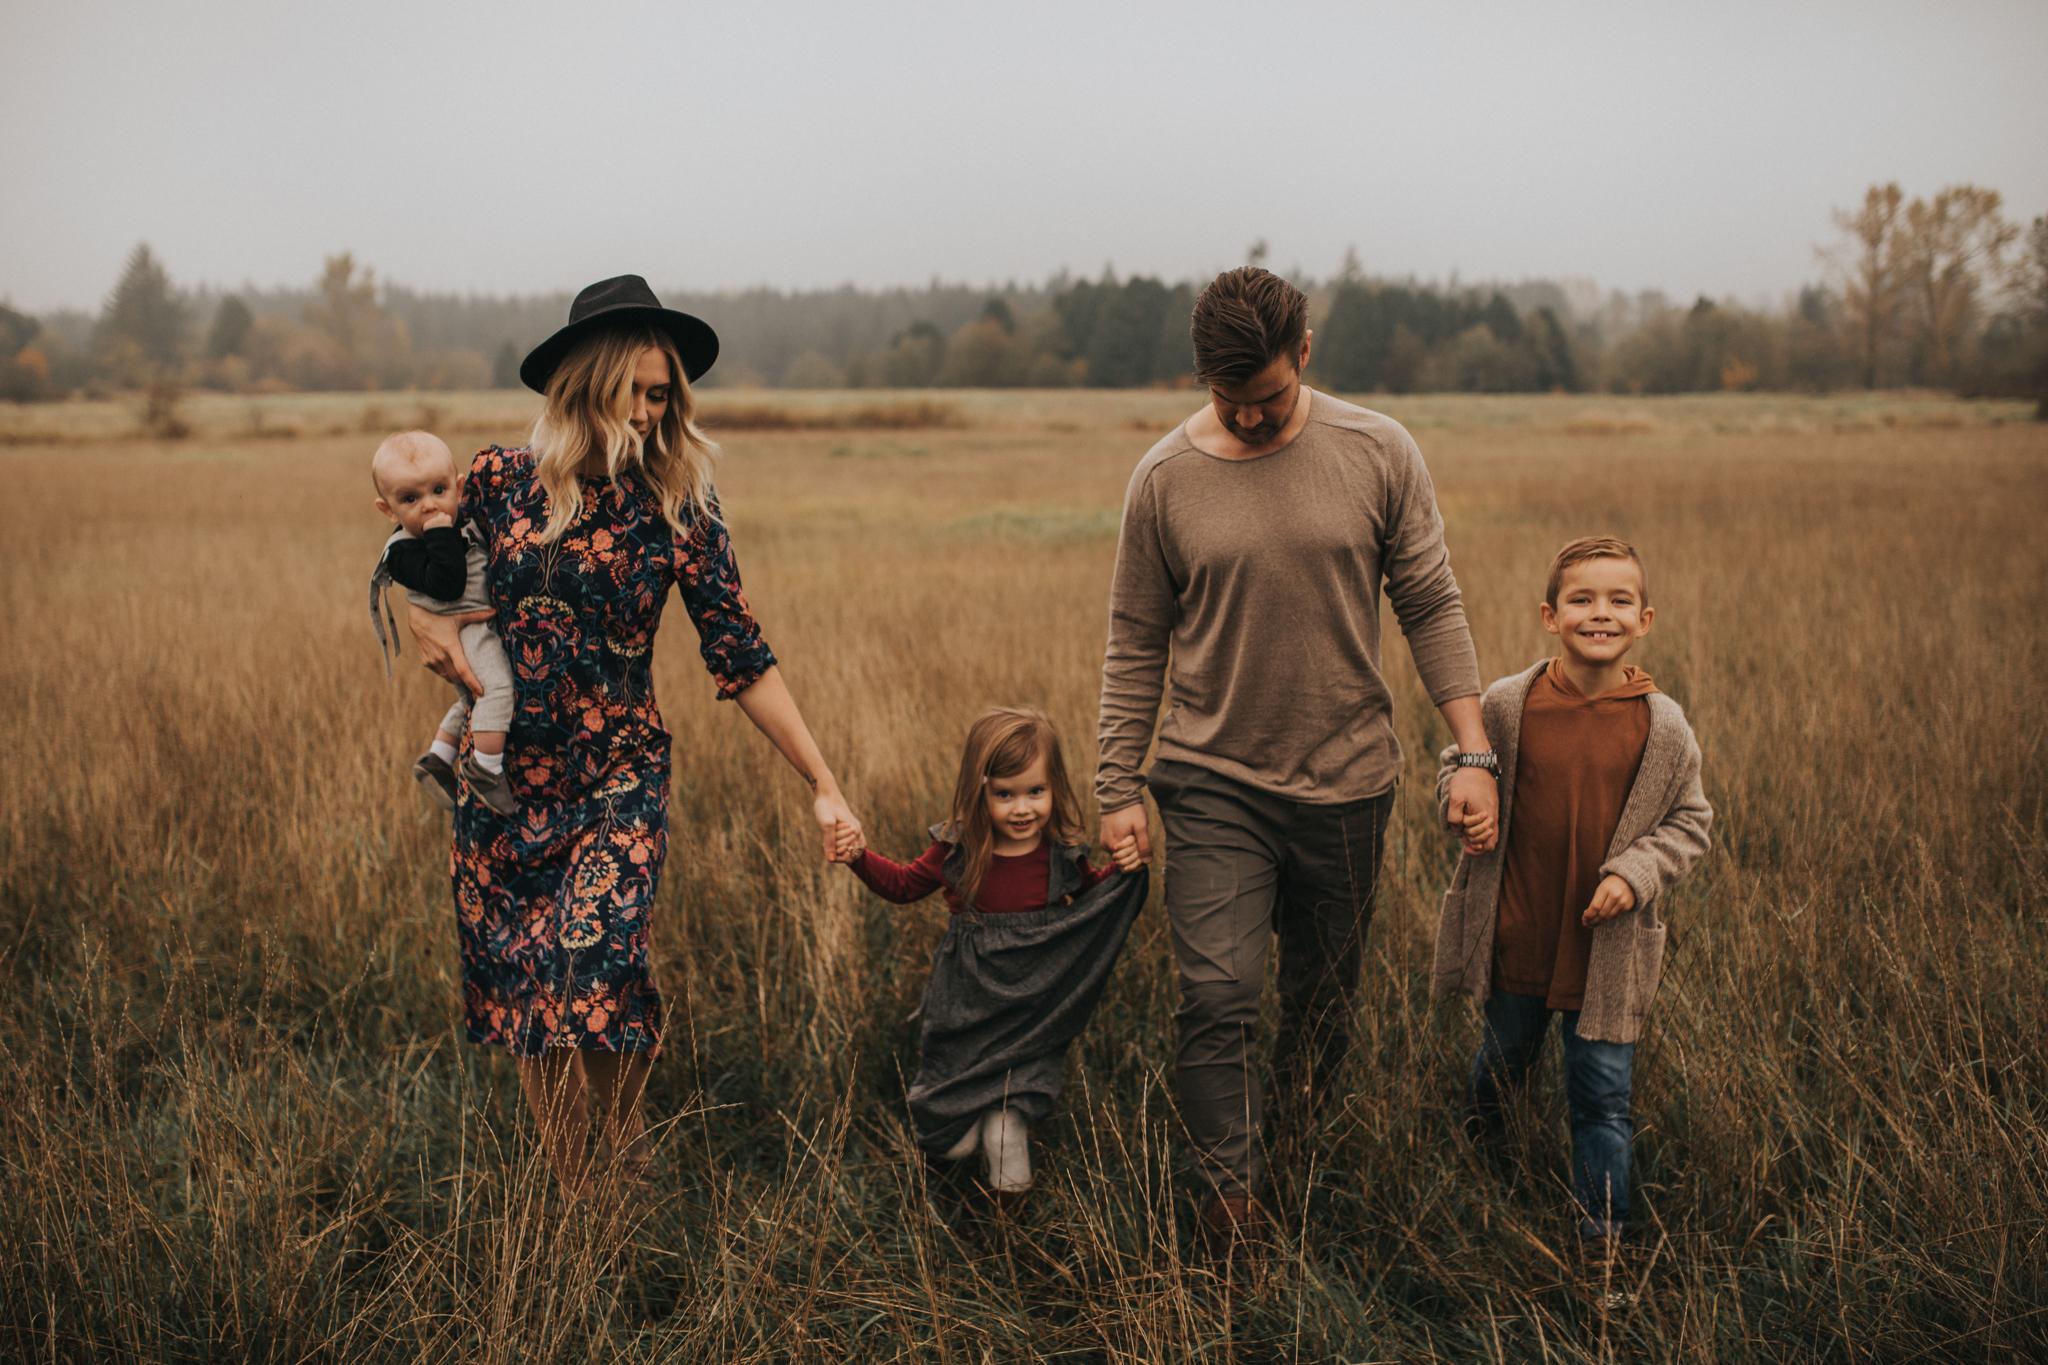 langley_family_photographer_boho_campbell_valley_park_14.JPG